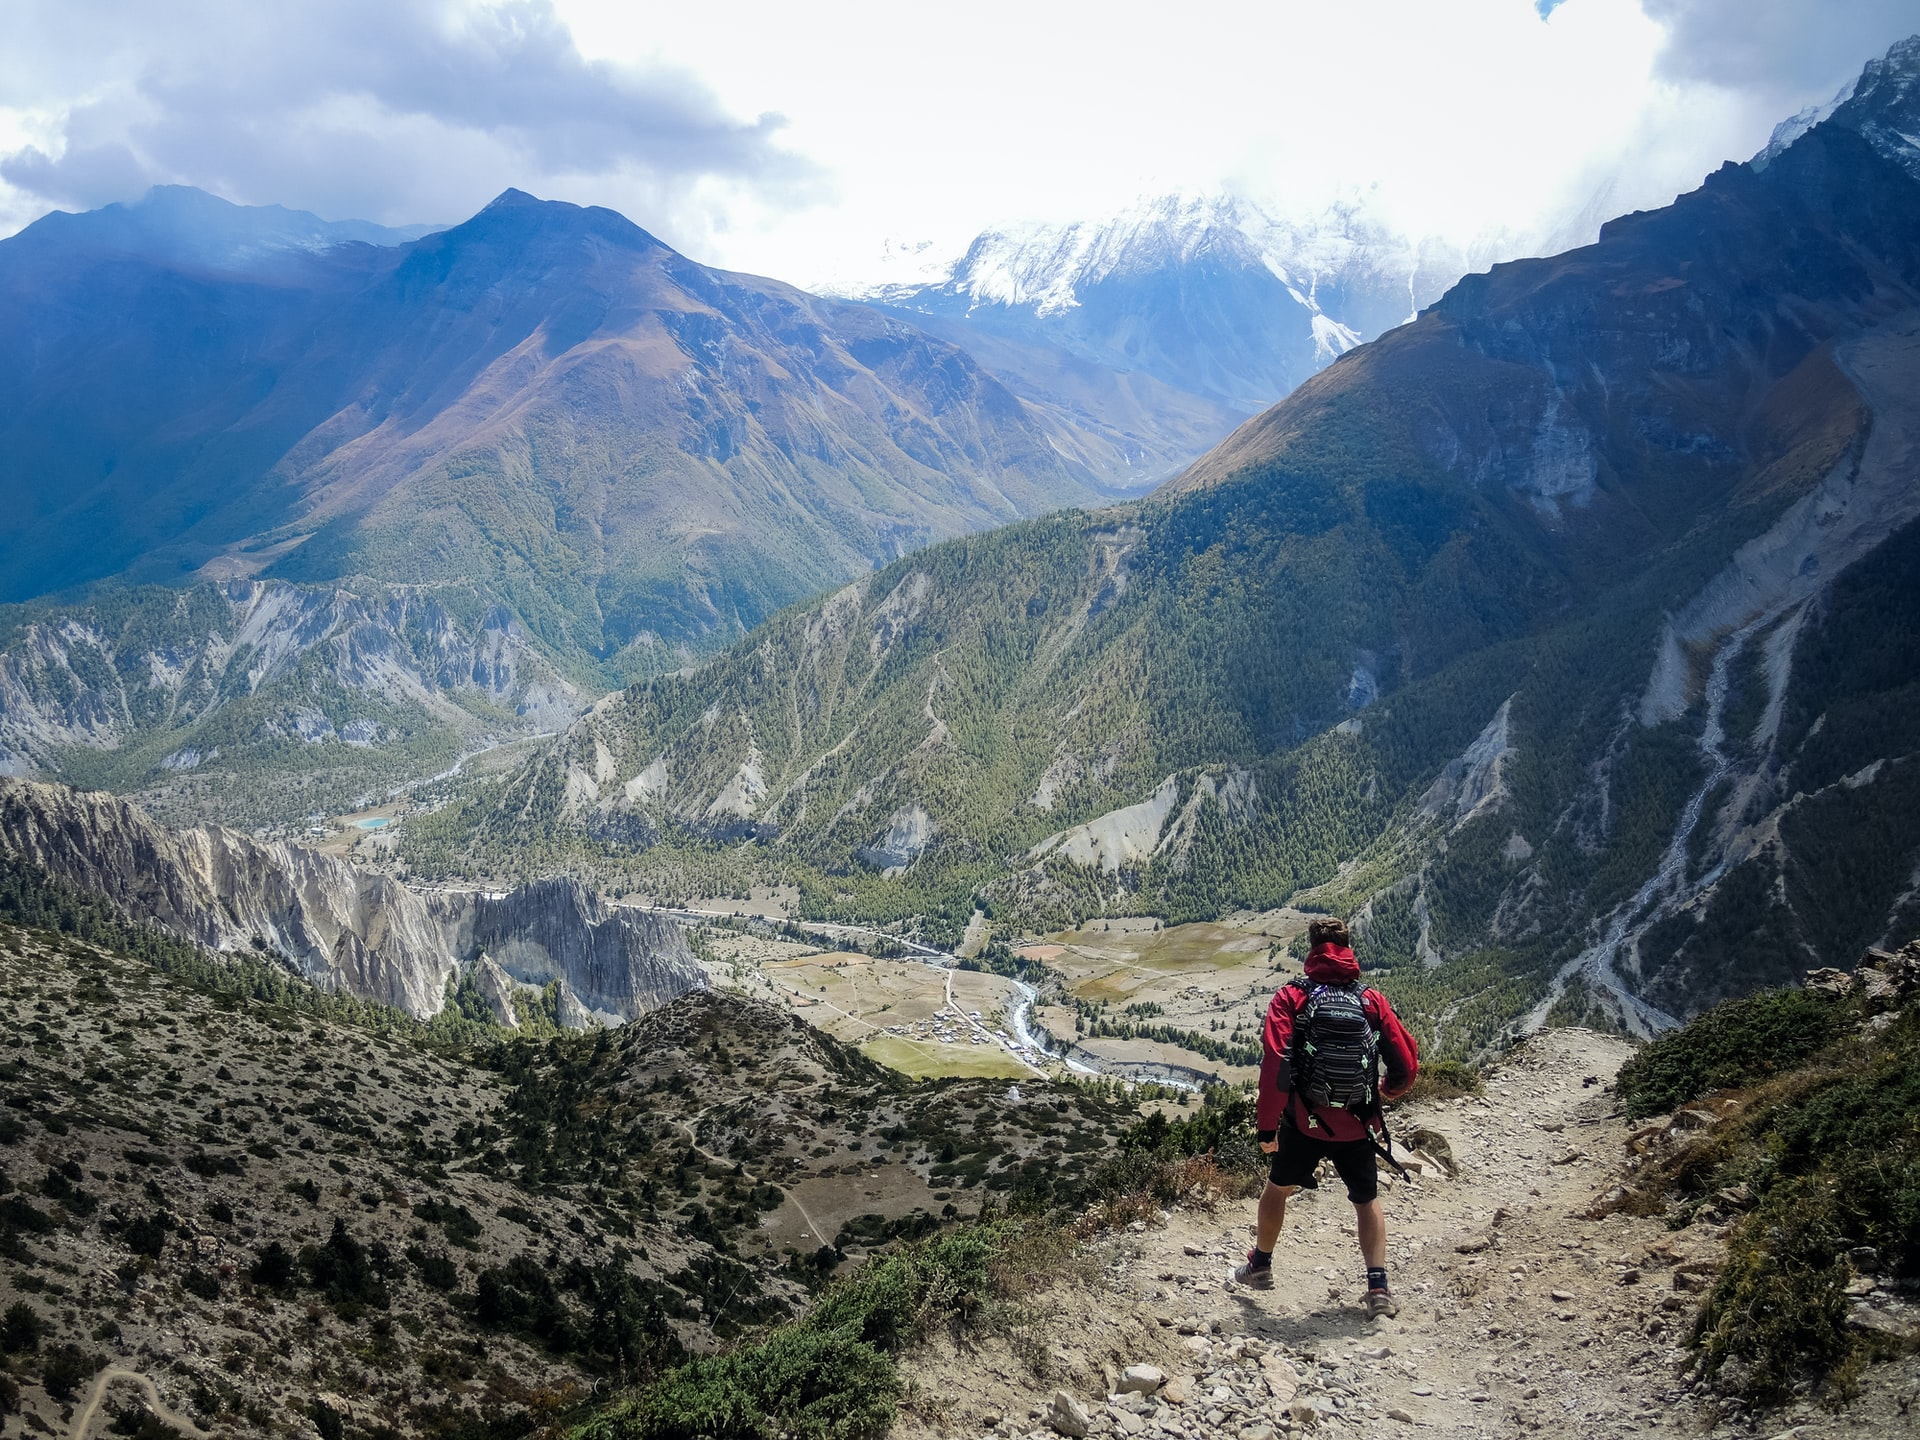 Annapurna-Circuit-Trek, best monsoon treks in Nepal